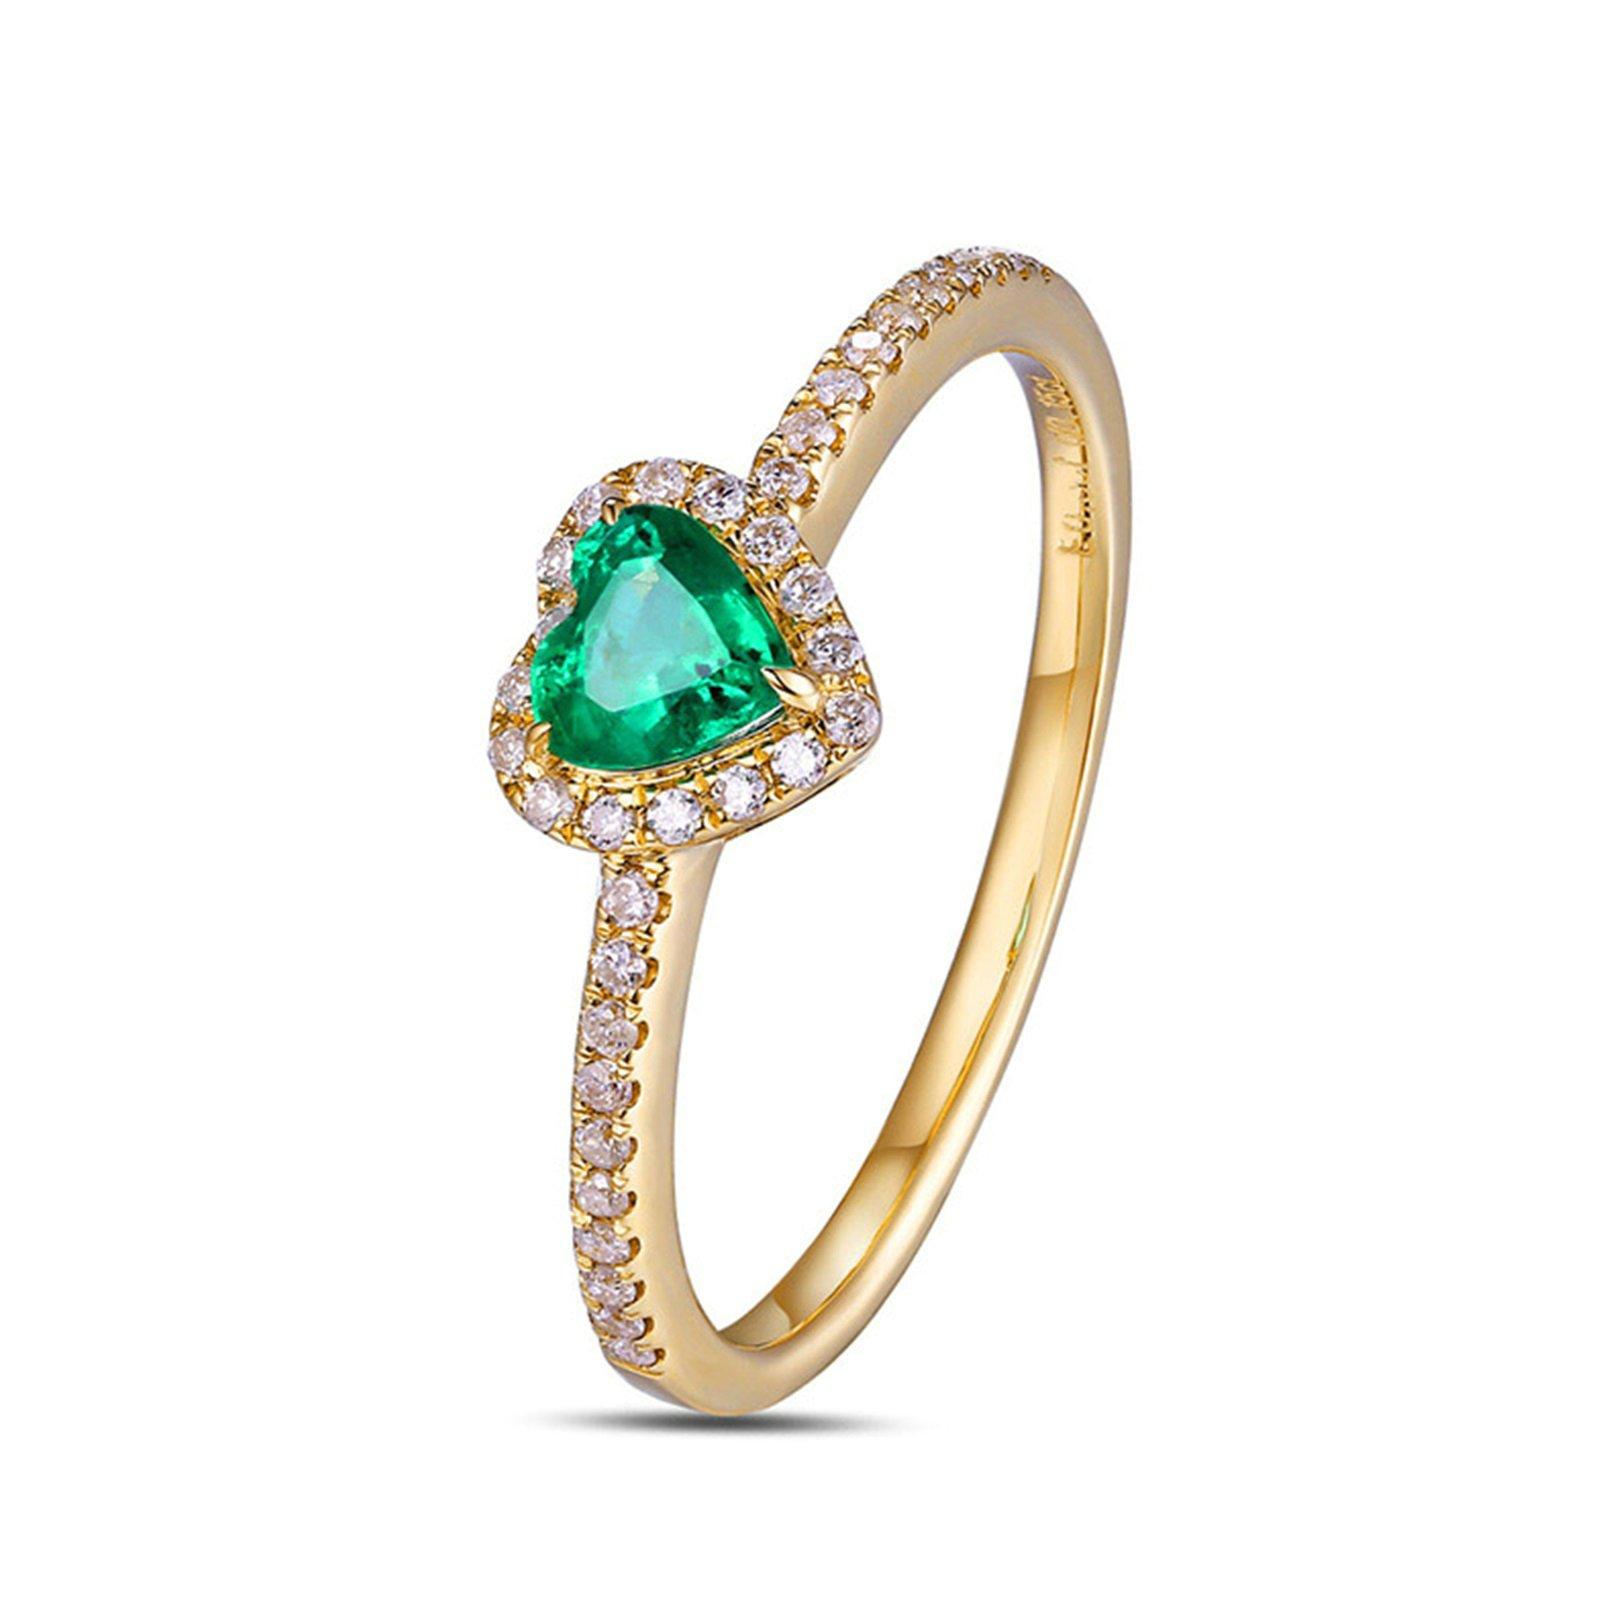 KnSam Ring Gold 18 Karat Damen Goldring 18 Karat Herz Trauring Natürlich 0.3 Carat Smaragd 0.15 Carat Diamant Grün 1